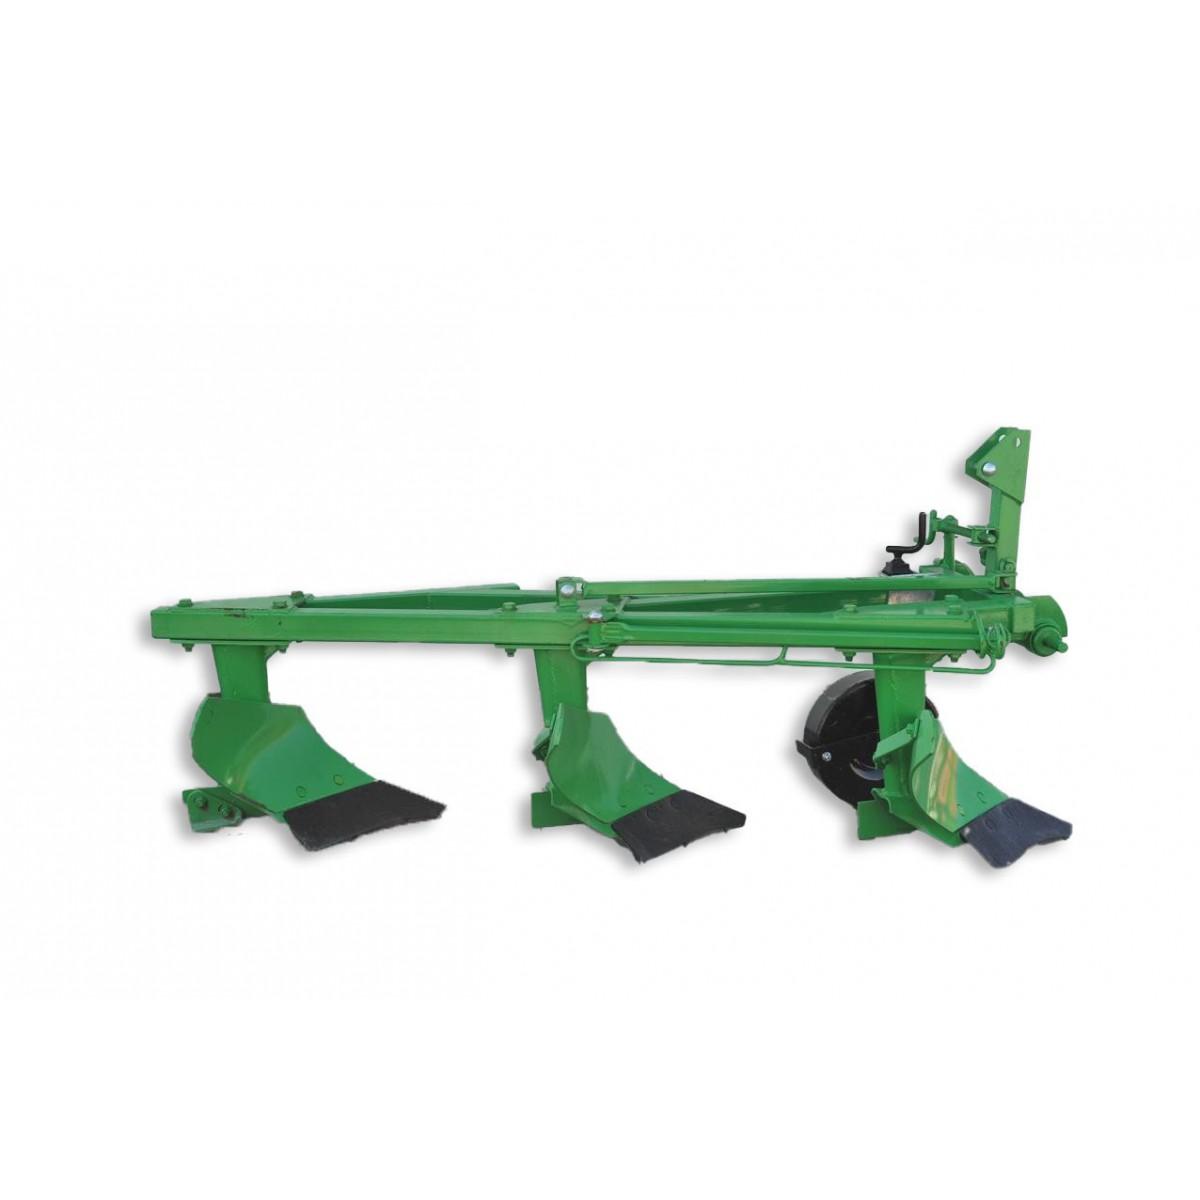 Three-row plow 75 cm 3L-1